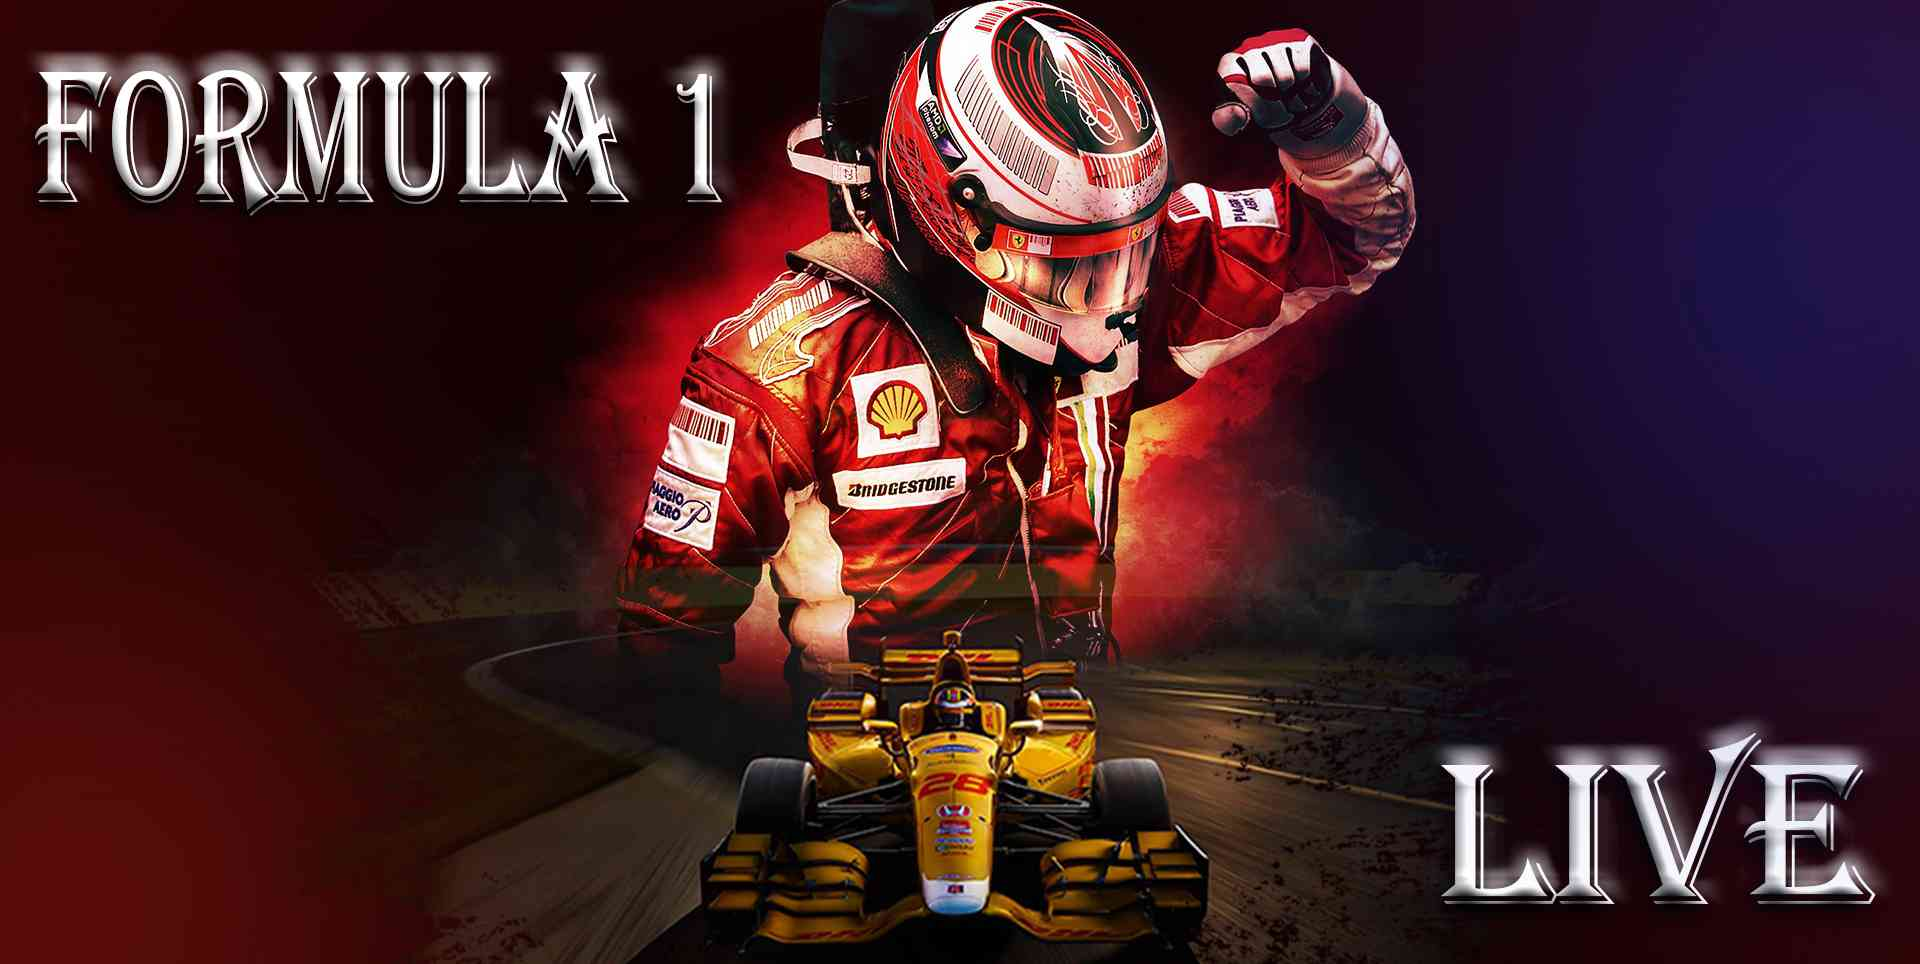 2018 F1 Hungarian Grand Prix